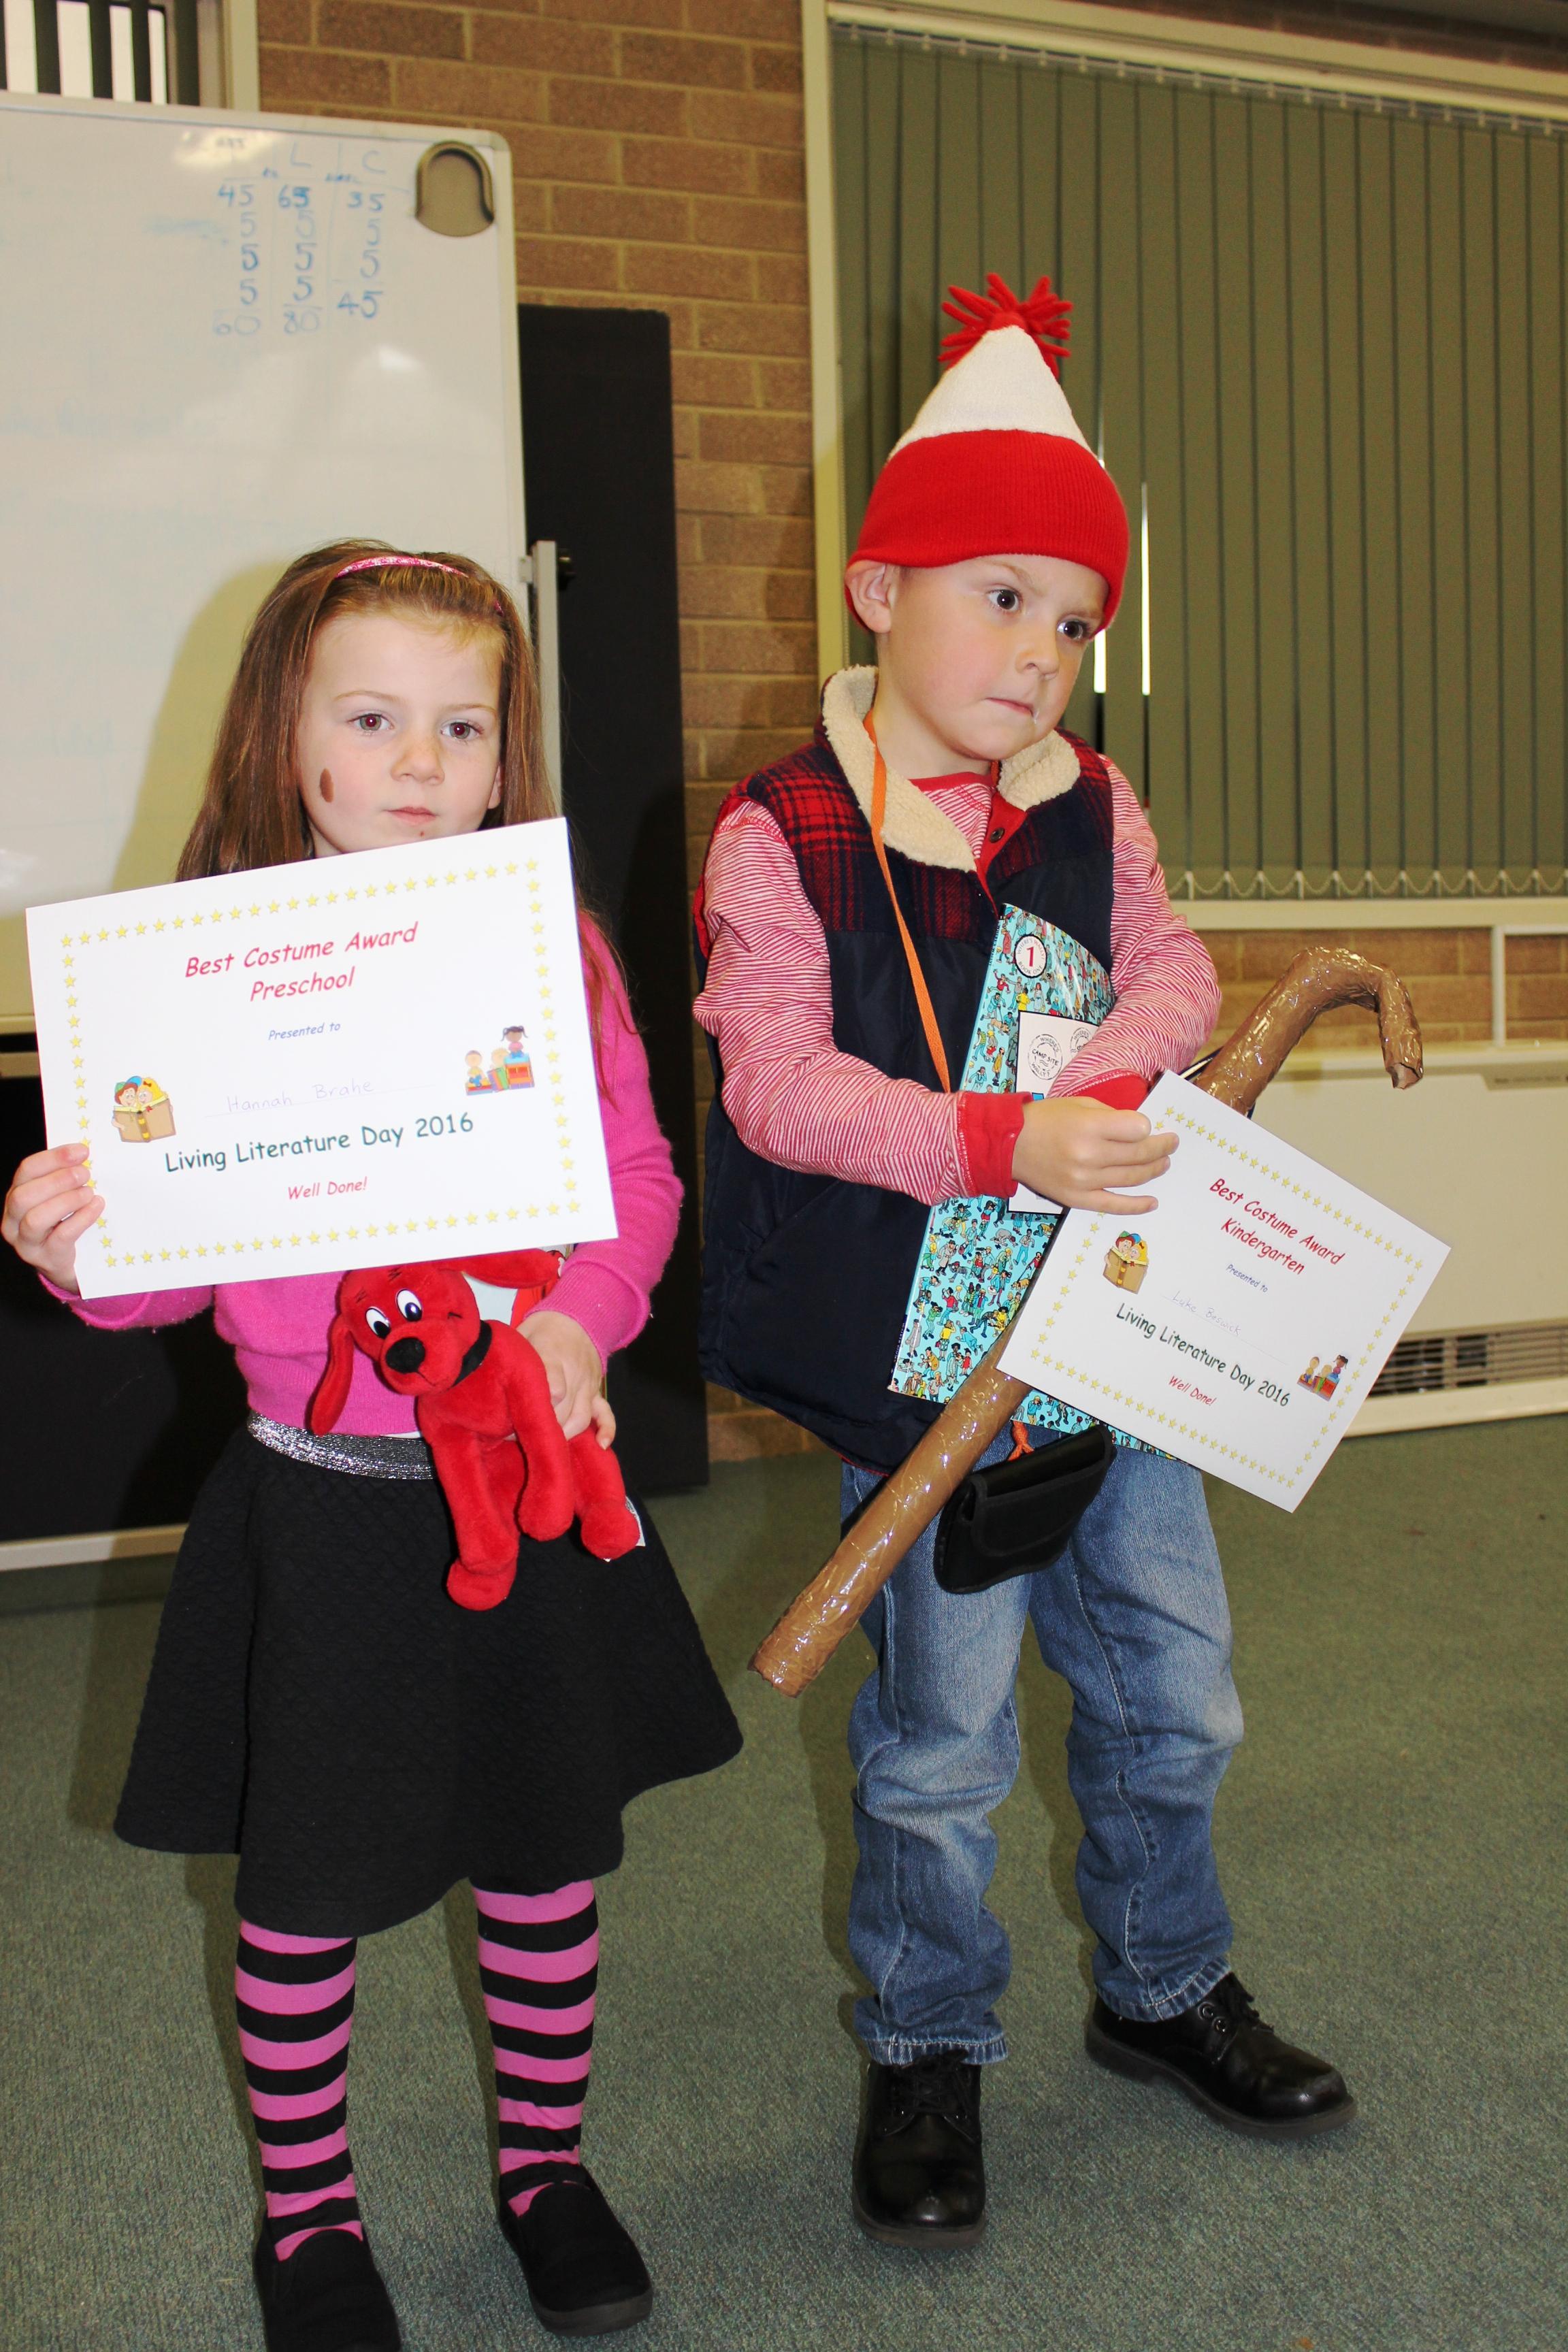 Preschool and Kind Winners